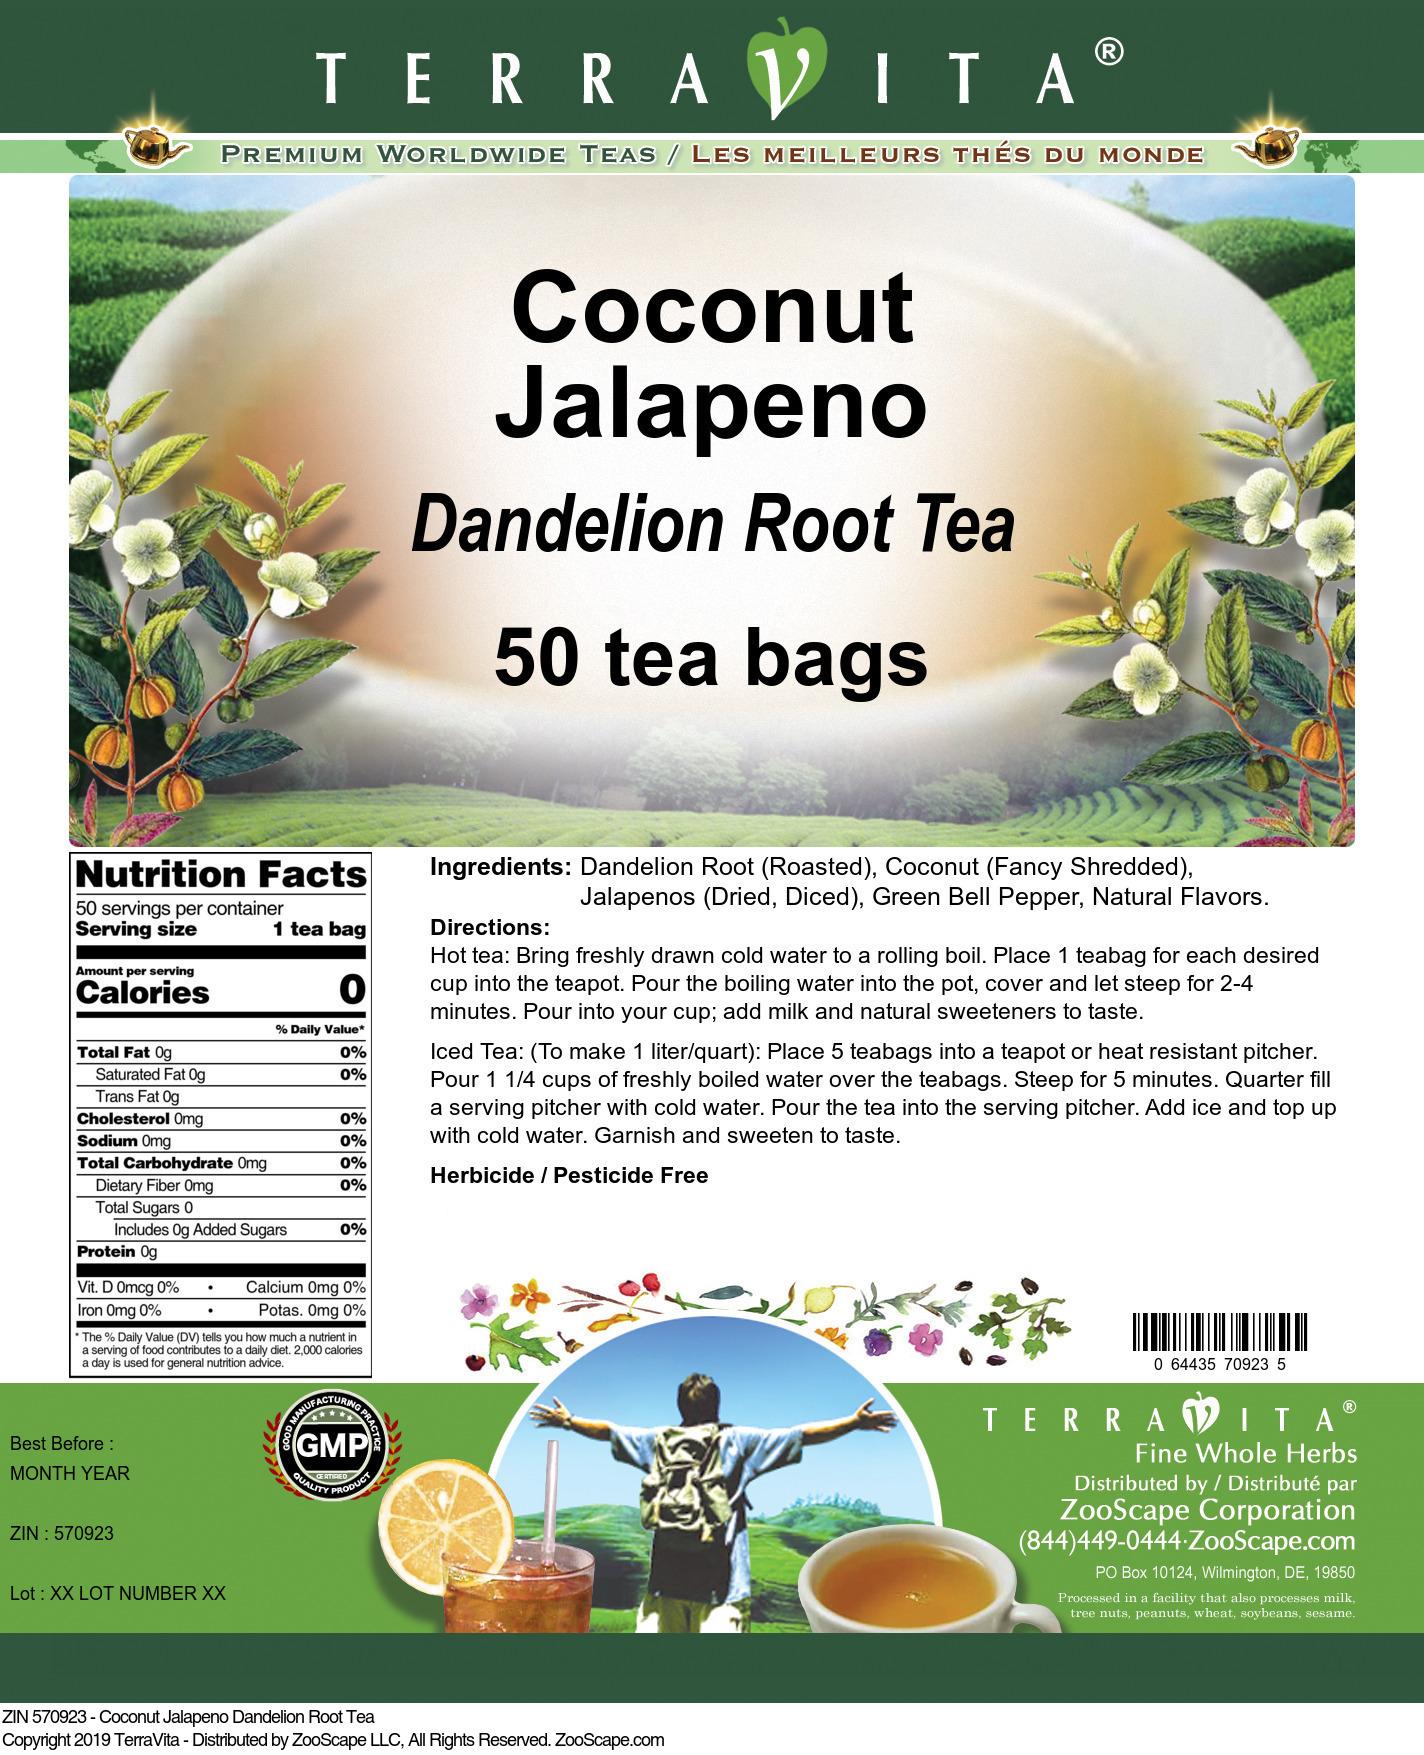 Coconut Jalapeno Dandelion Root